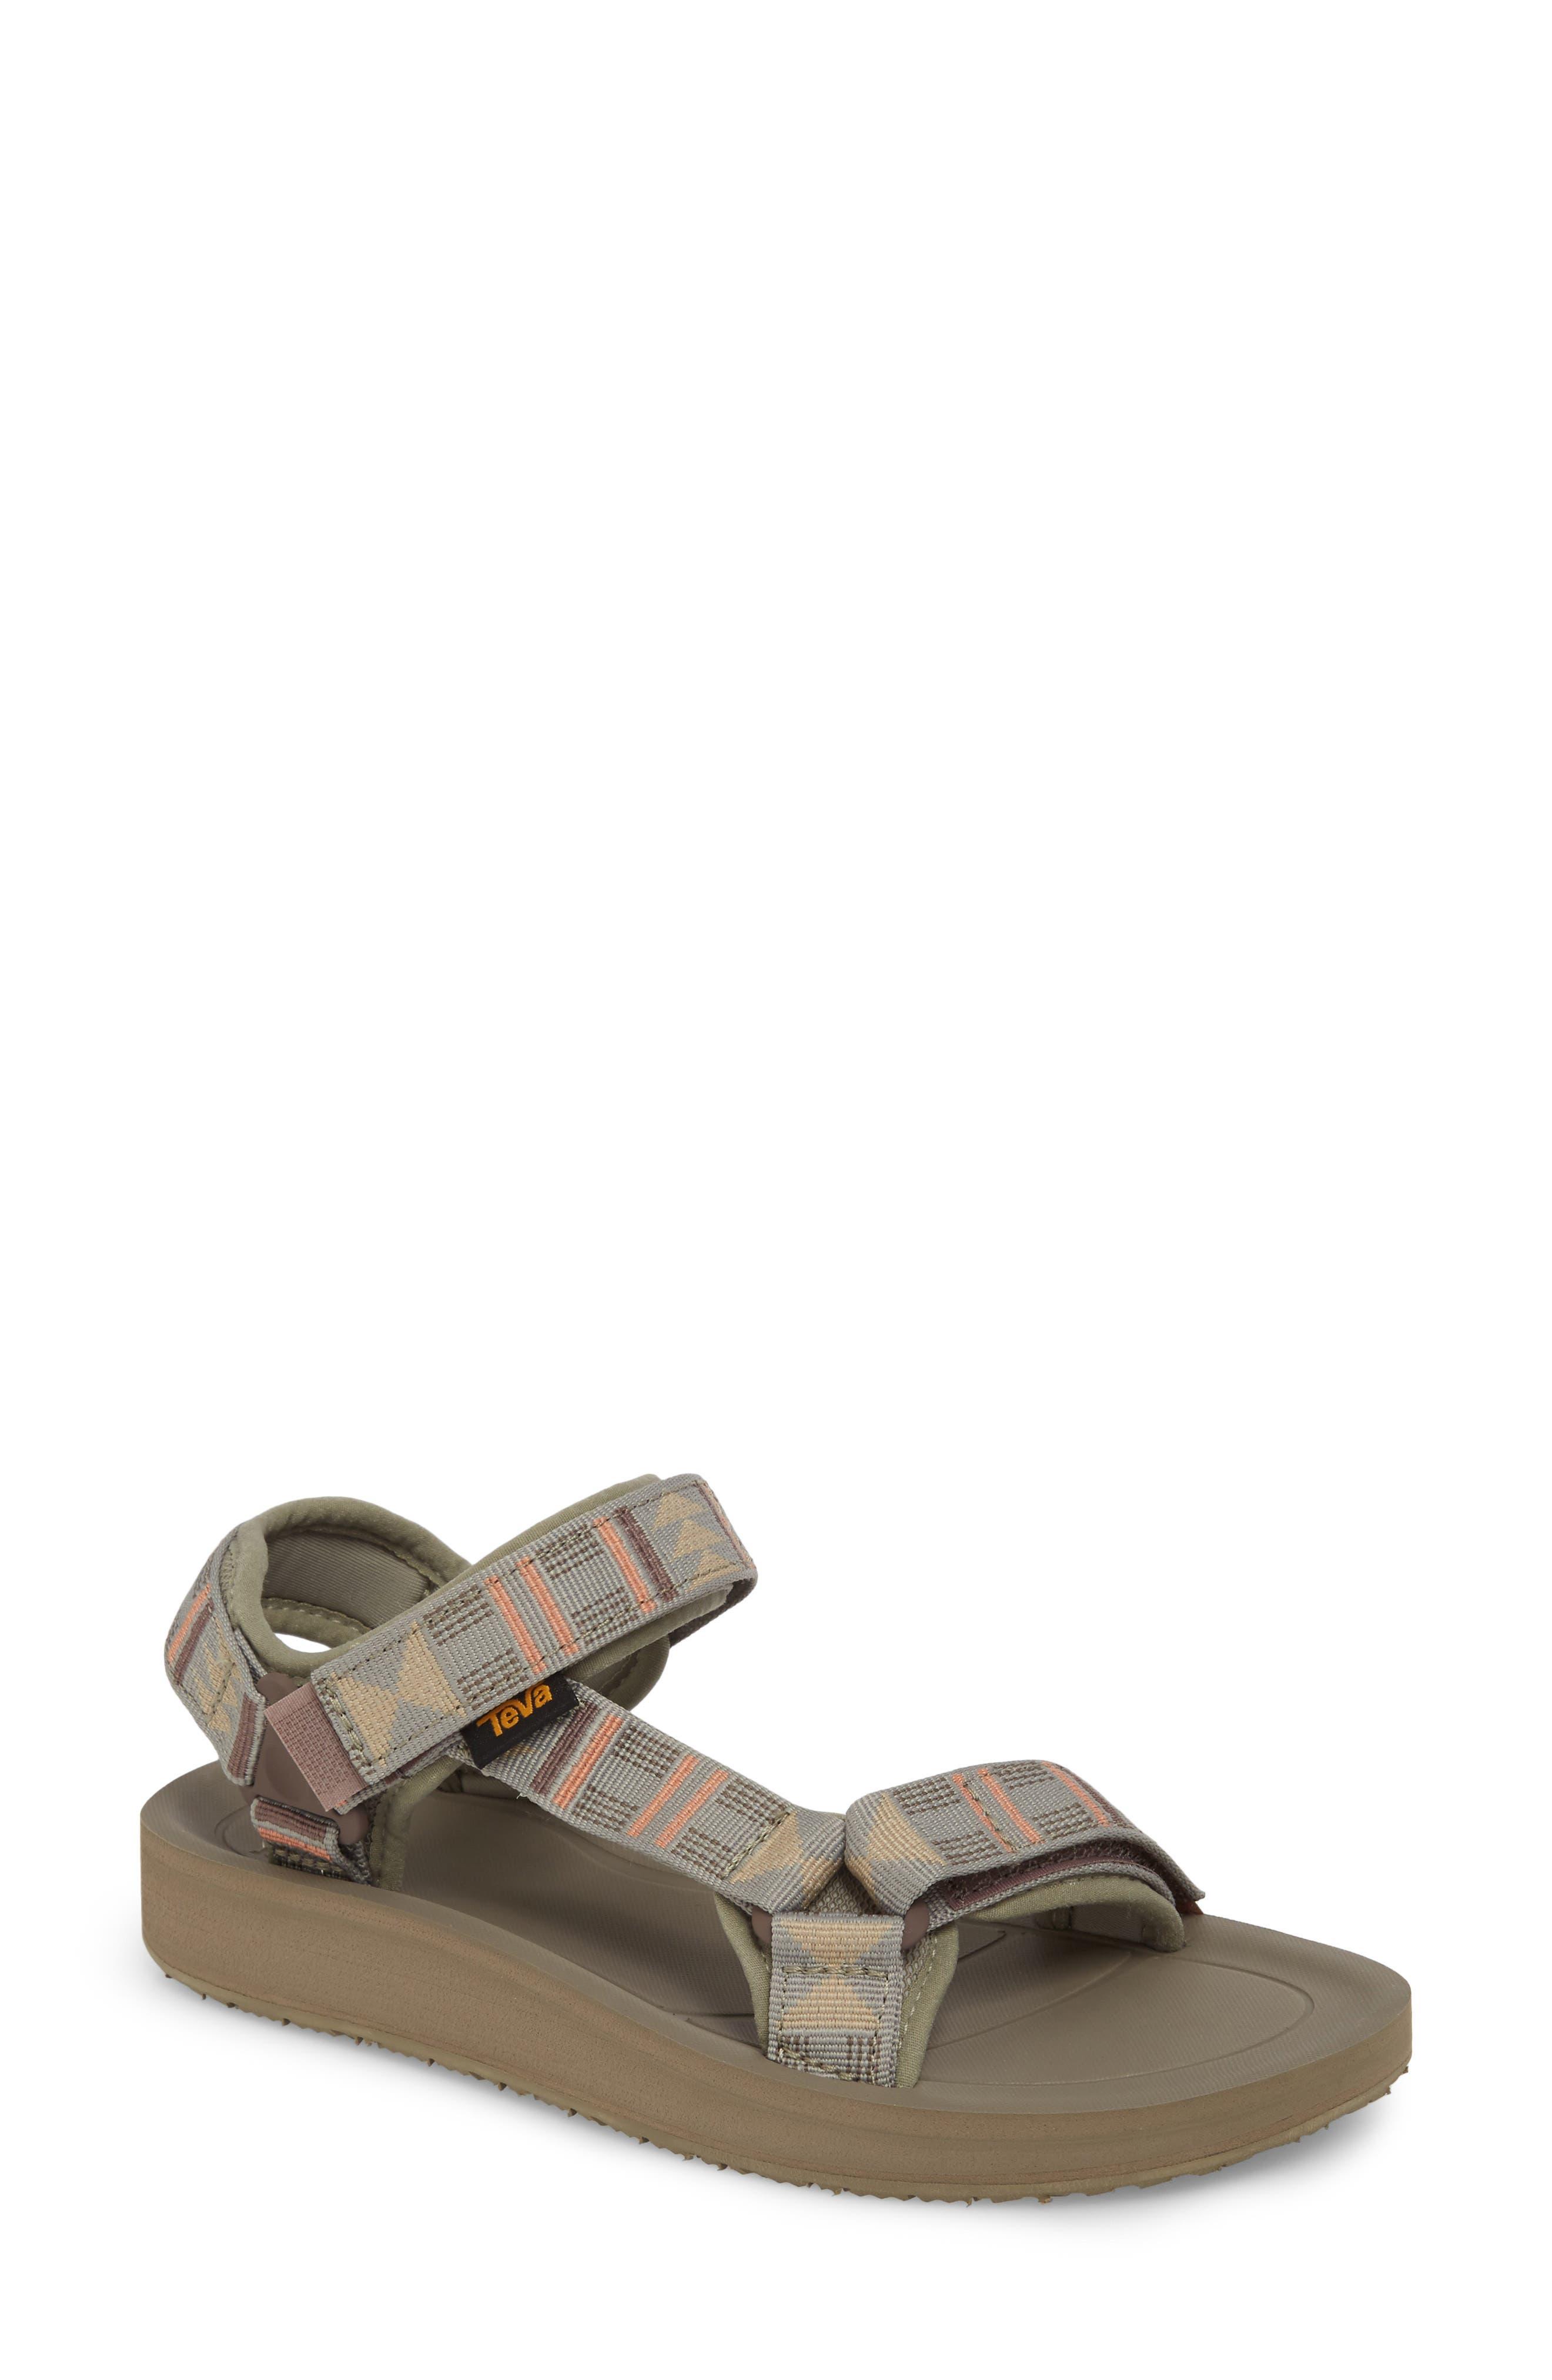 Teva Original Universal Premier Sandal (Women)